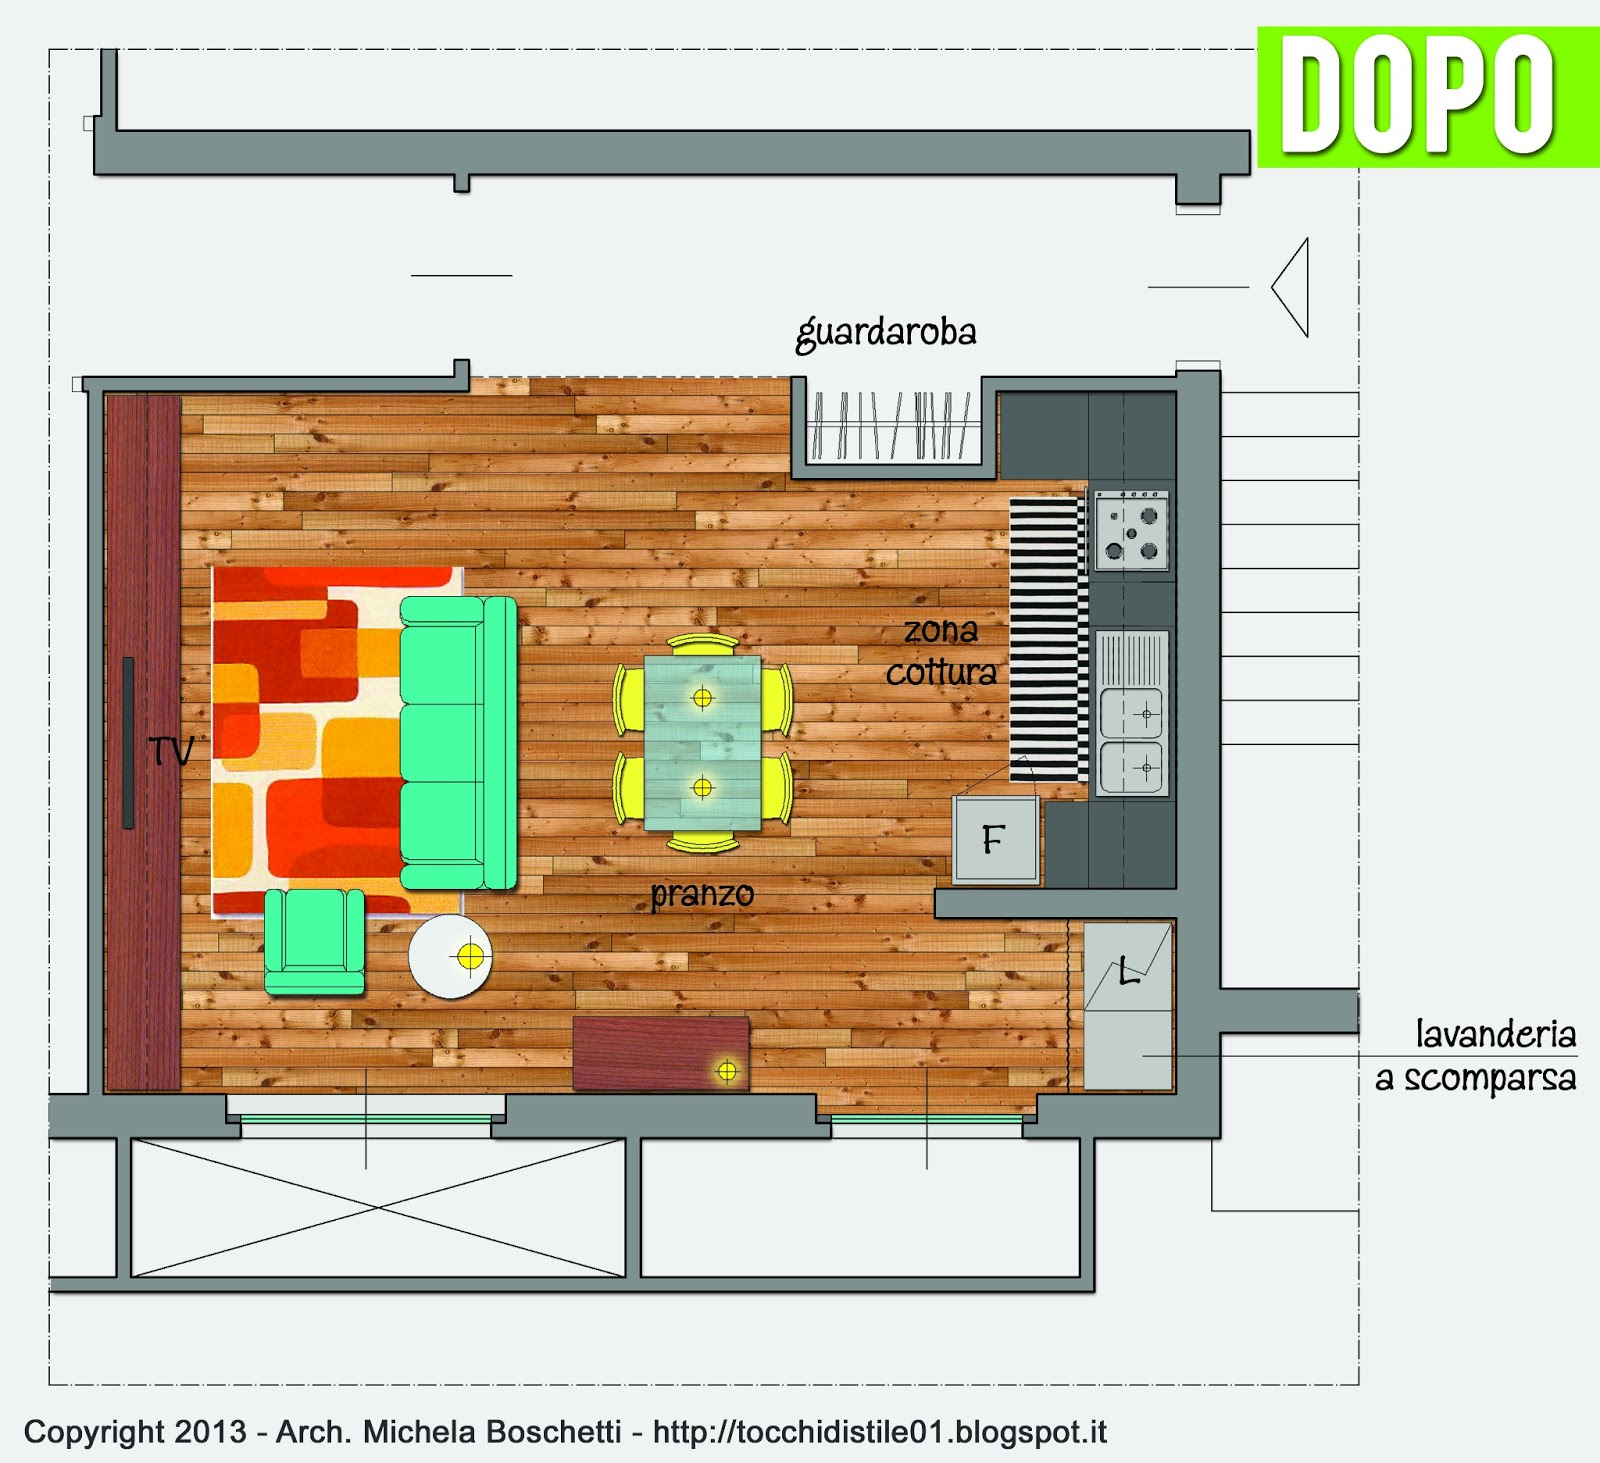 ambiente unico cucina soggiorno ~ dragtime for . - Cucina Soggiorno Unico Ambiente Classico 2